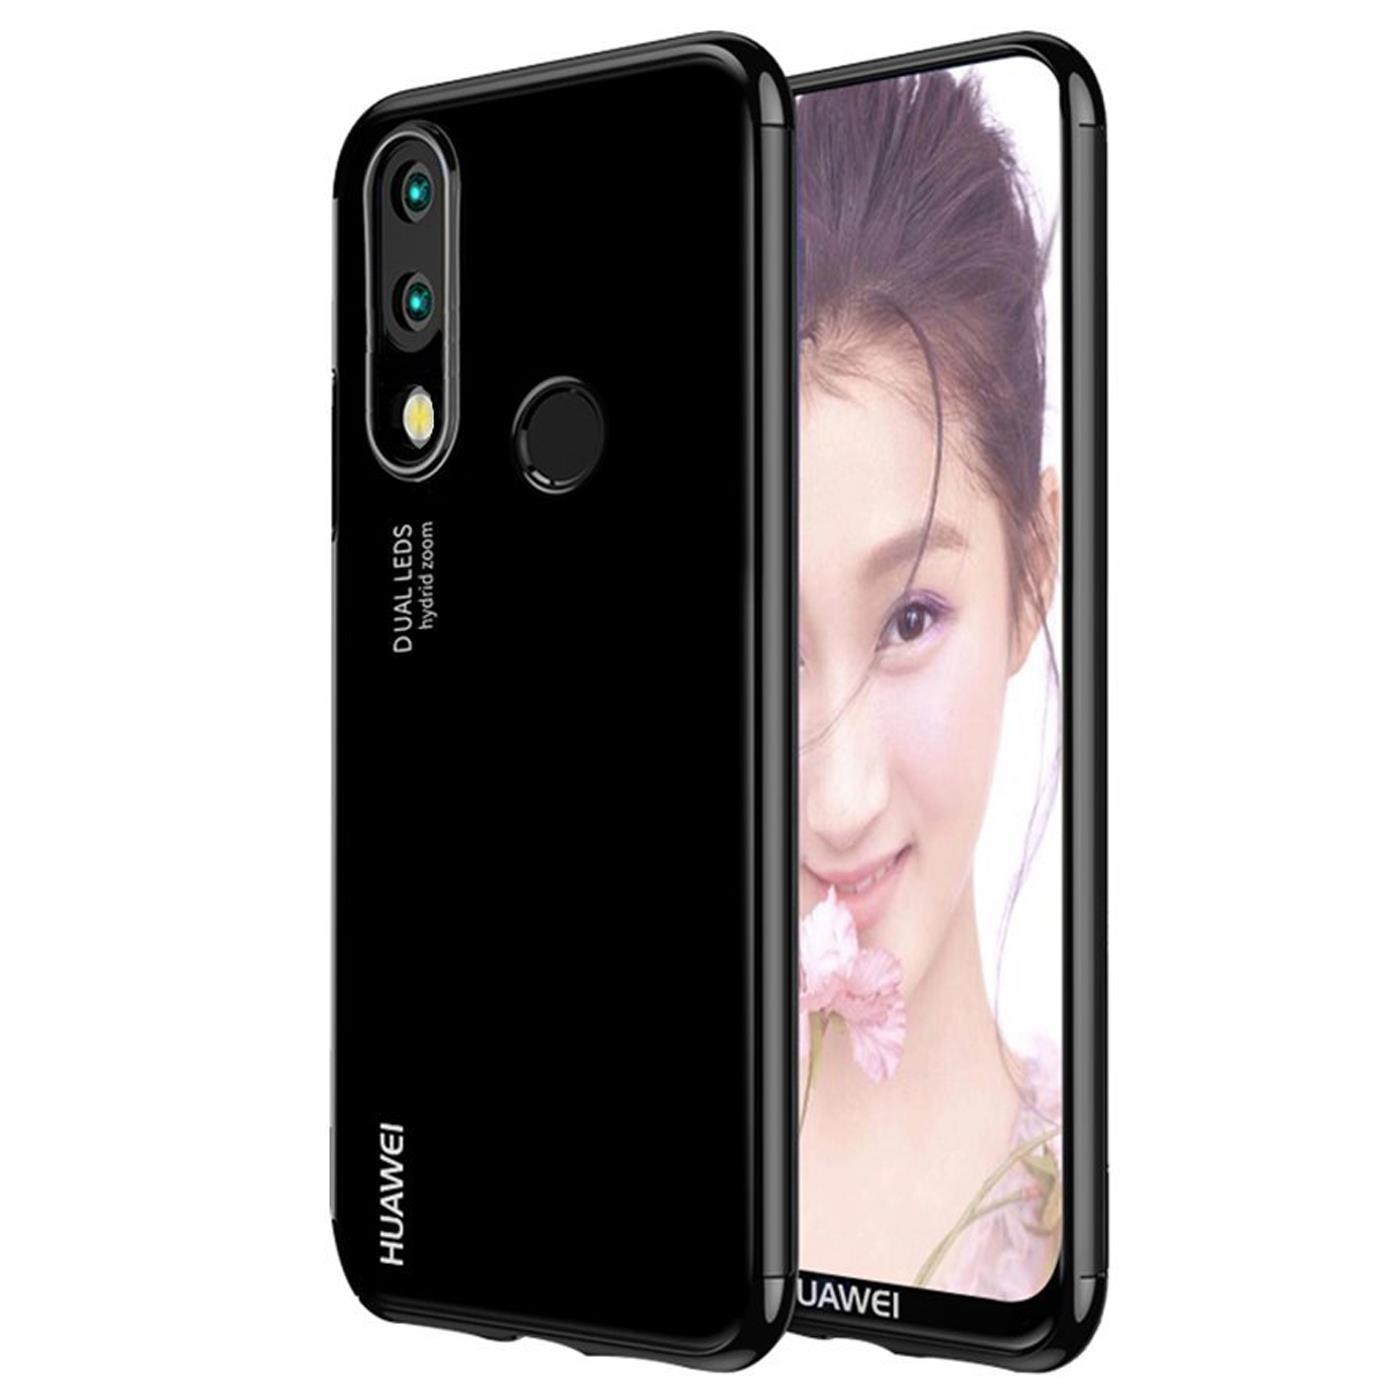 Silikon-Klar-Case-fuer-Huawei-p20-Lite-Ultra-Slim-Stossfeste-Gel-Rueckseite Indexbild 8